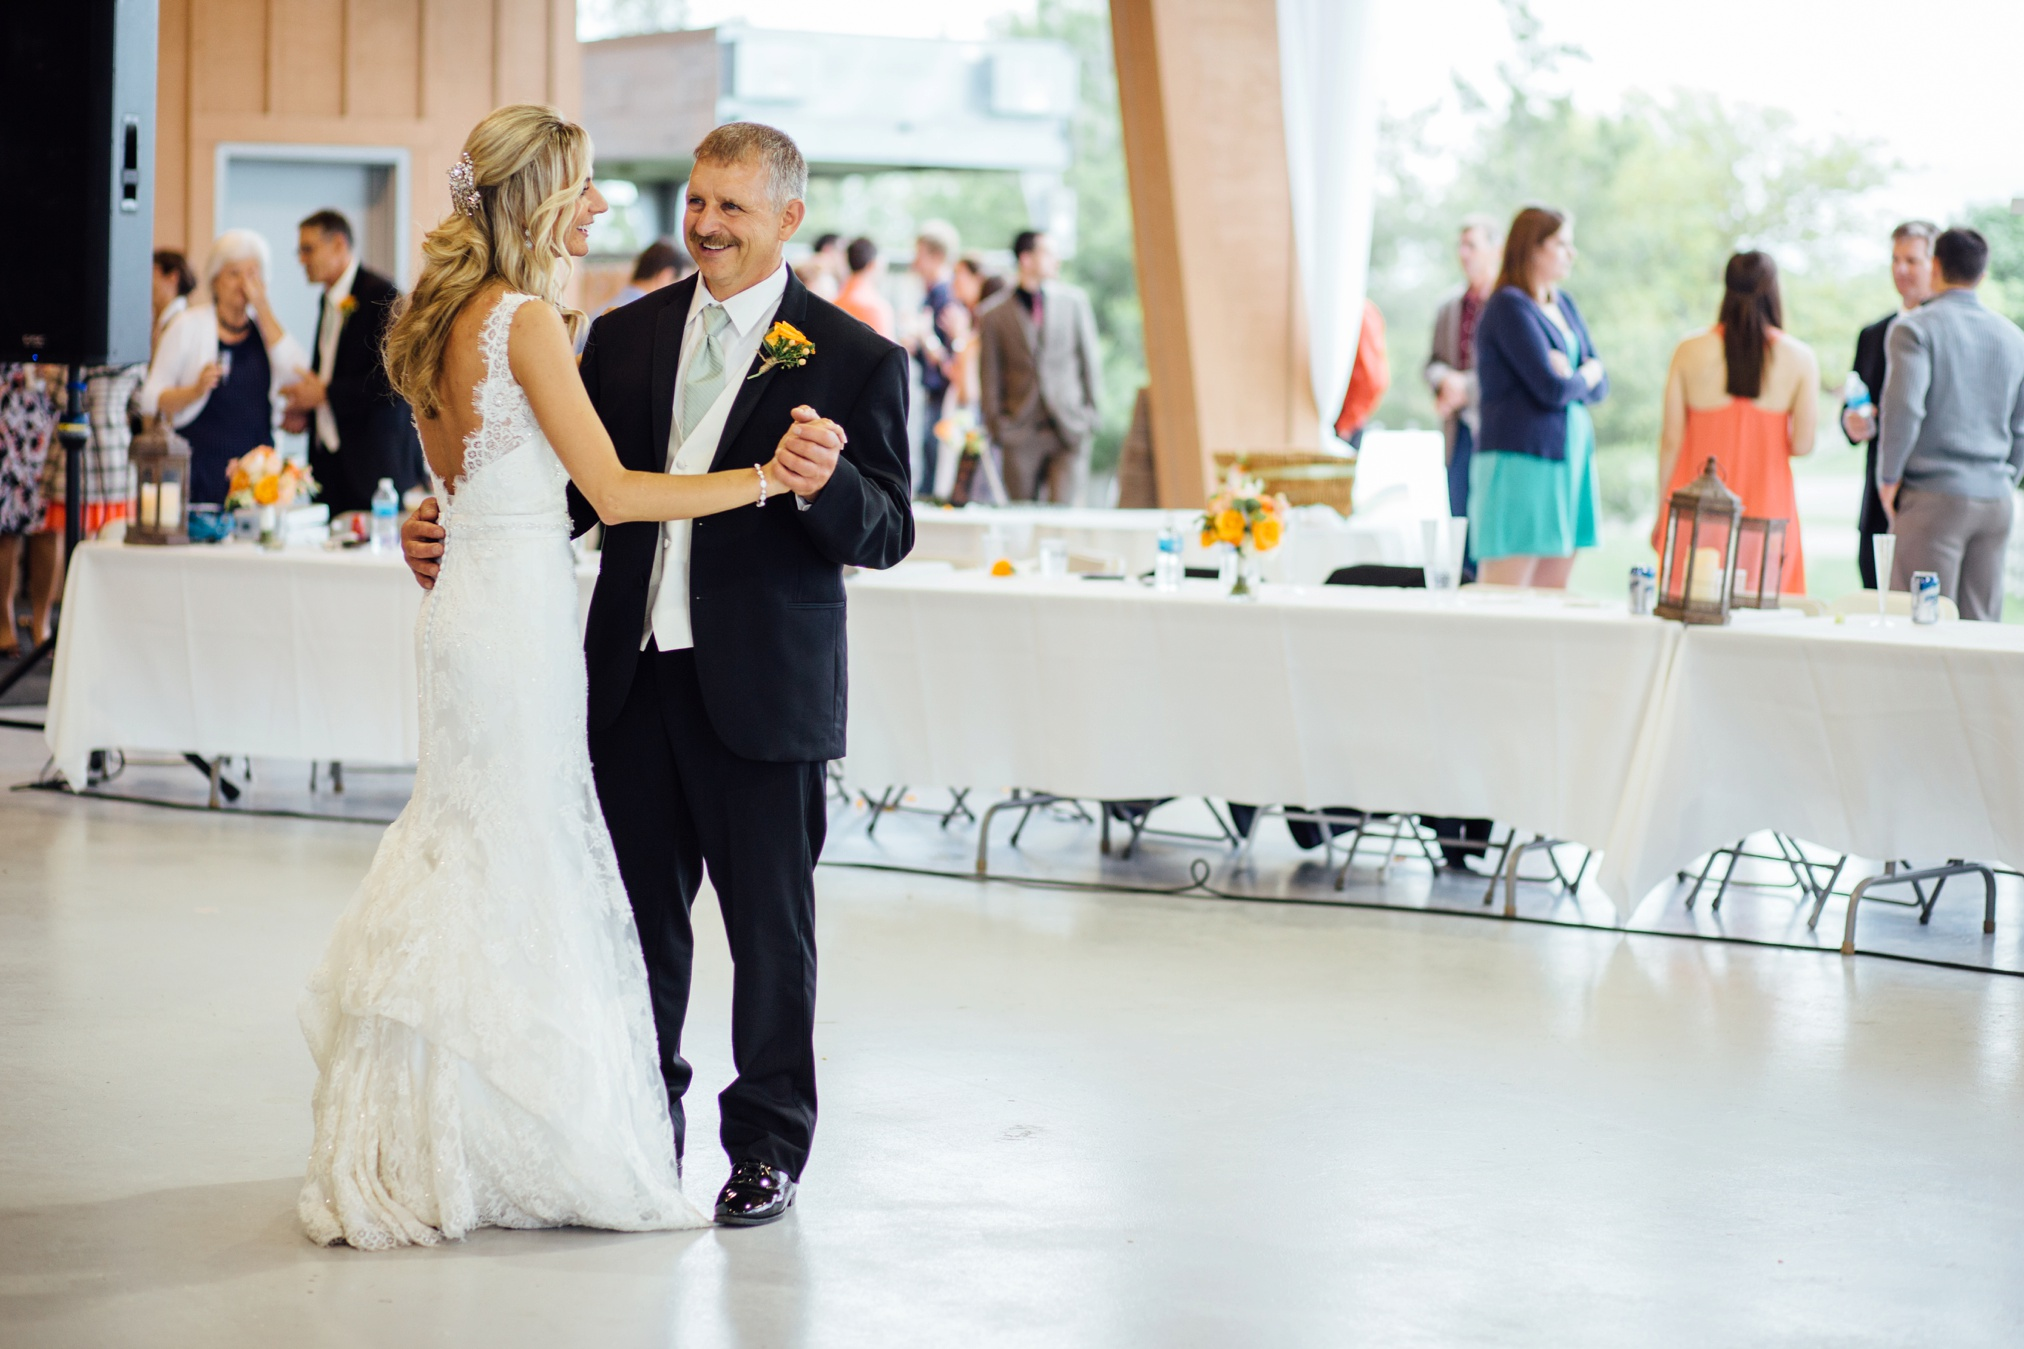 schmid_wedding-783.jpg